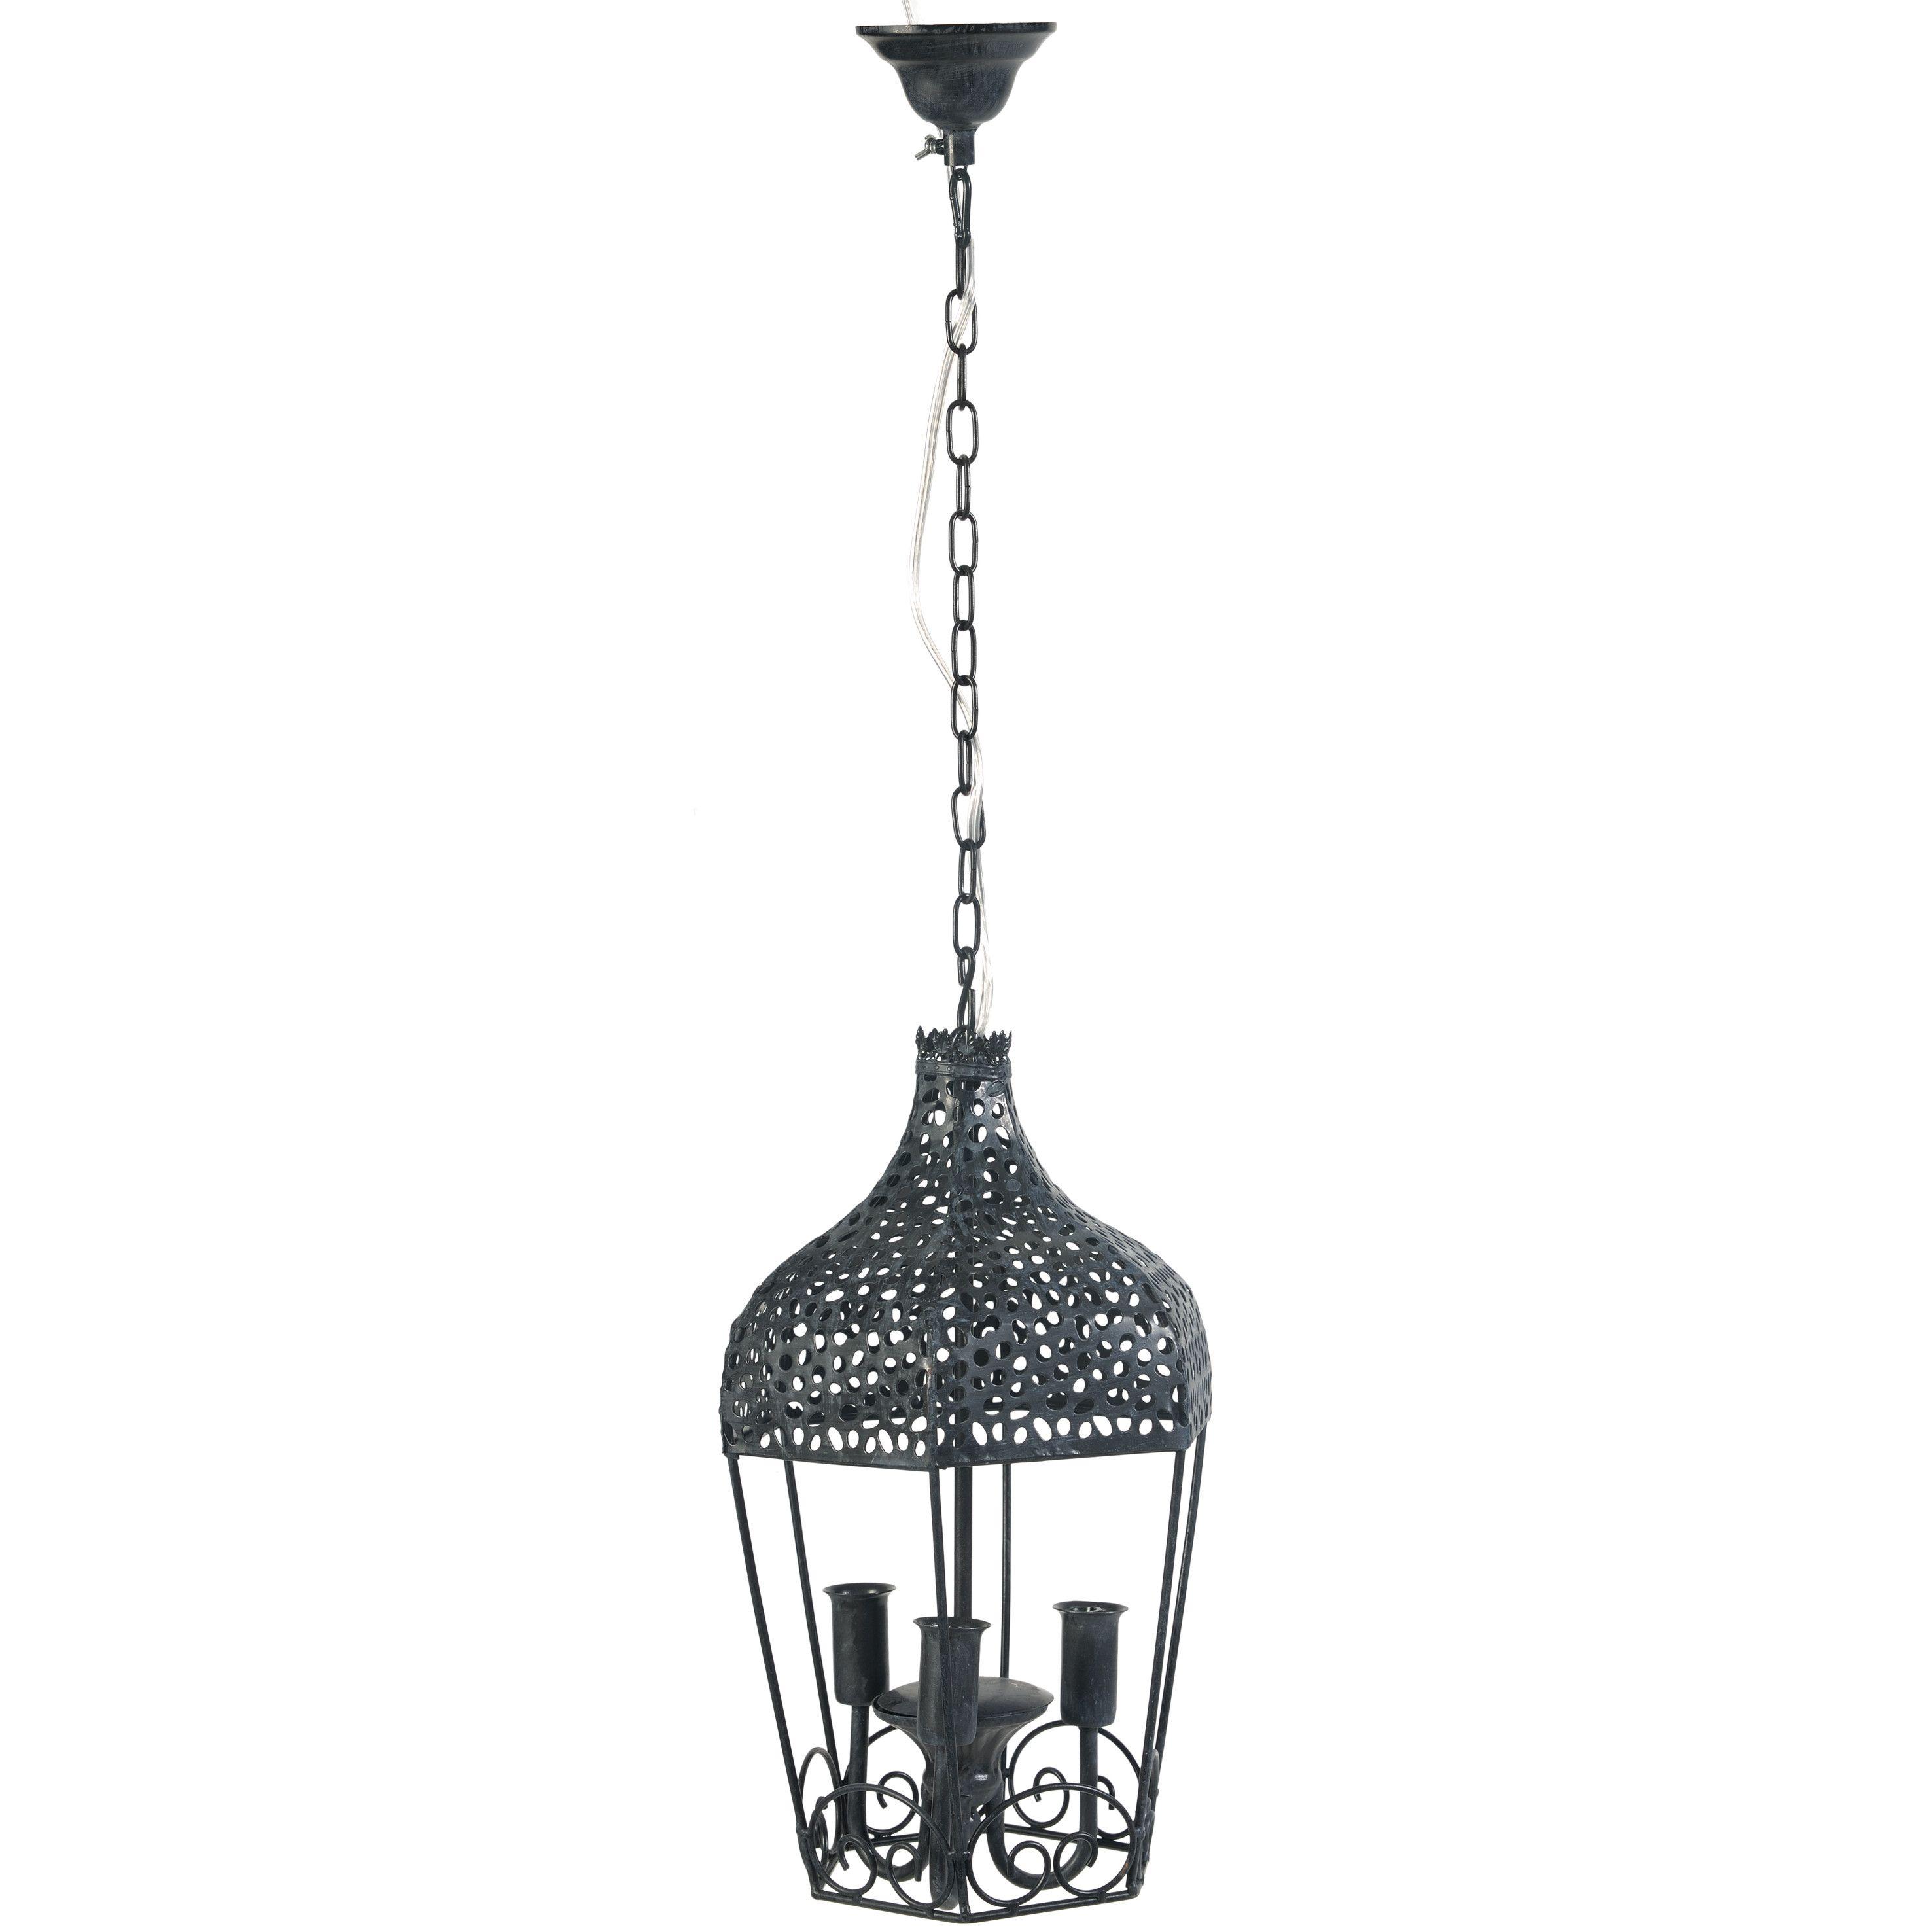 Ab home group inc 3 light mini candle chandelier swiss miss ab home group inc 3 light mini candle chandelier aloadofball Choice Image